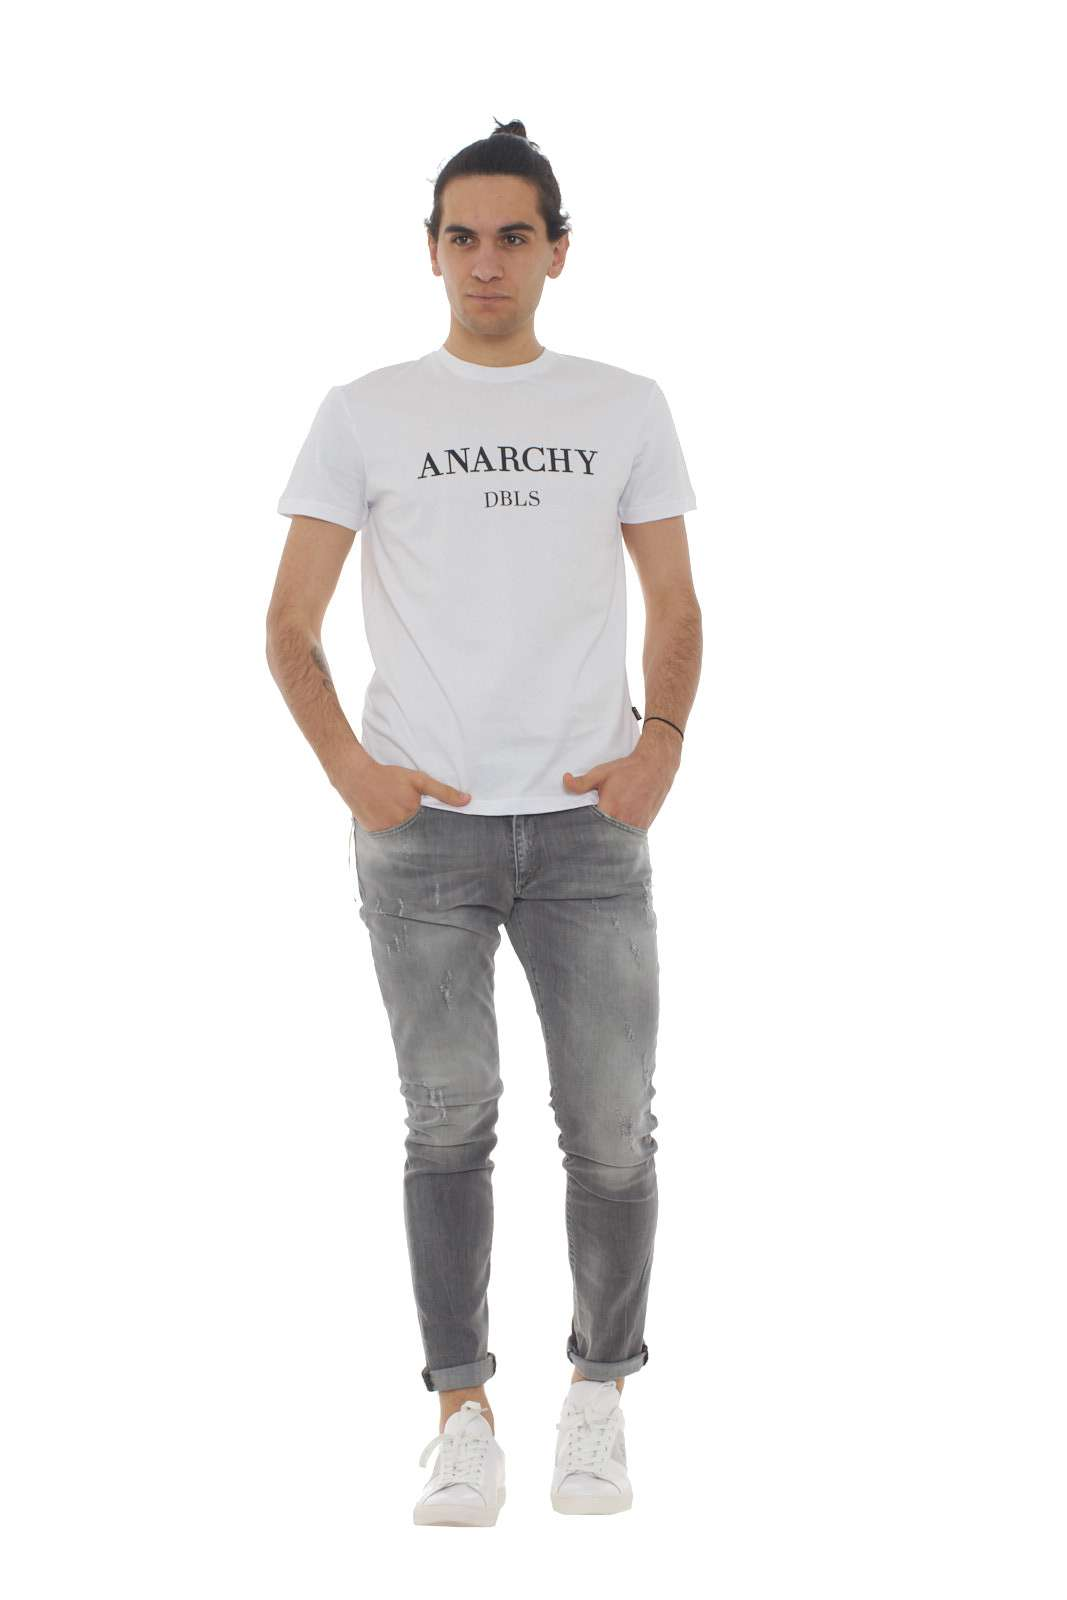 https://www.parmax.com/media/catalog/product/a/i/PE-outlet_parmax-denim-uomo-Clink-Jeans-London-MARTIN-D.jpg